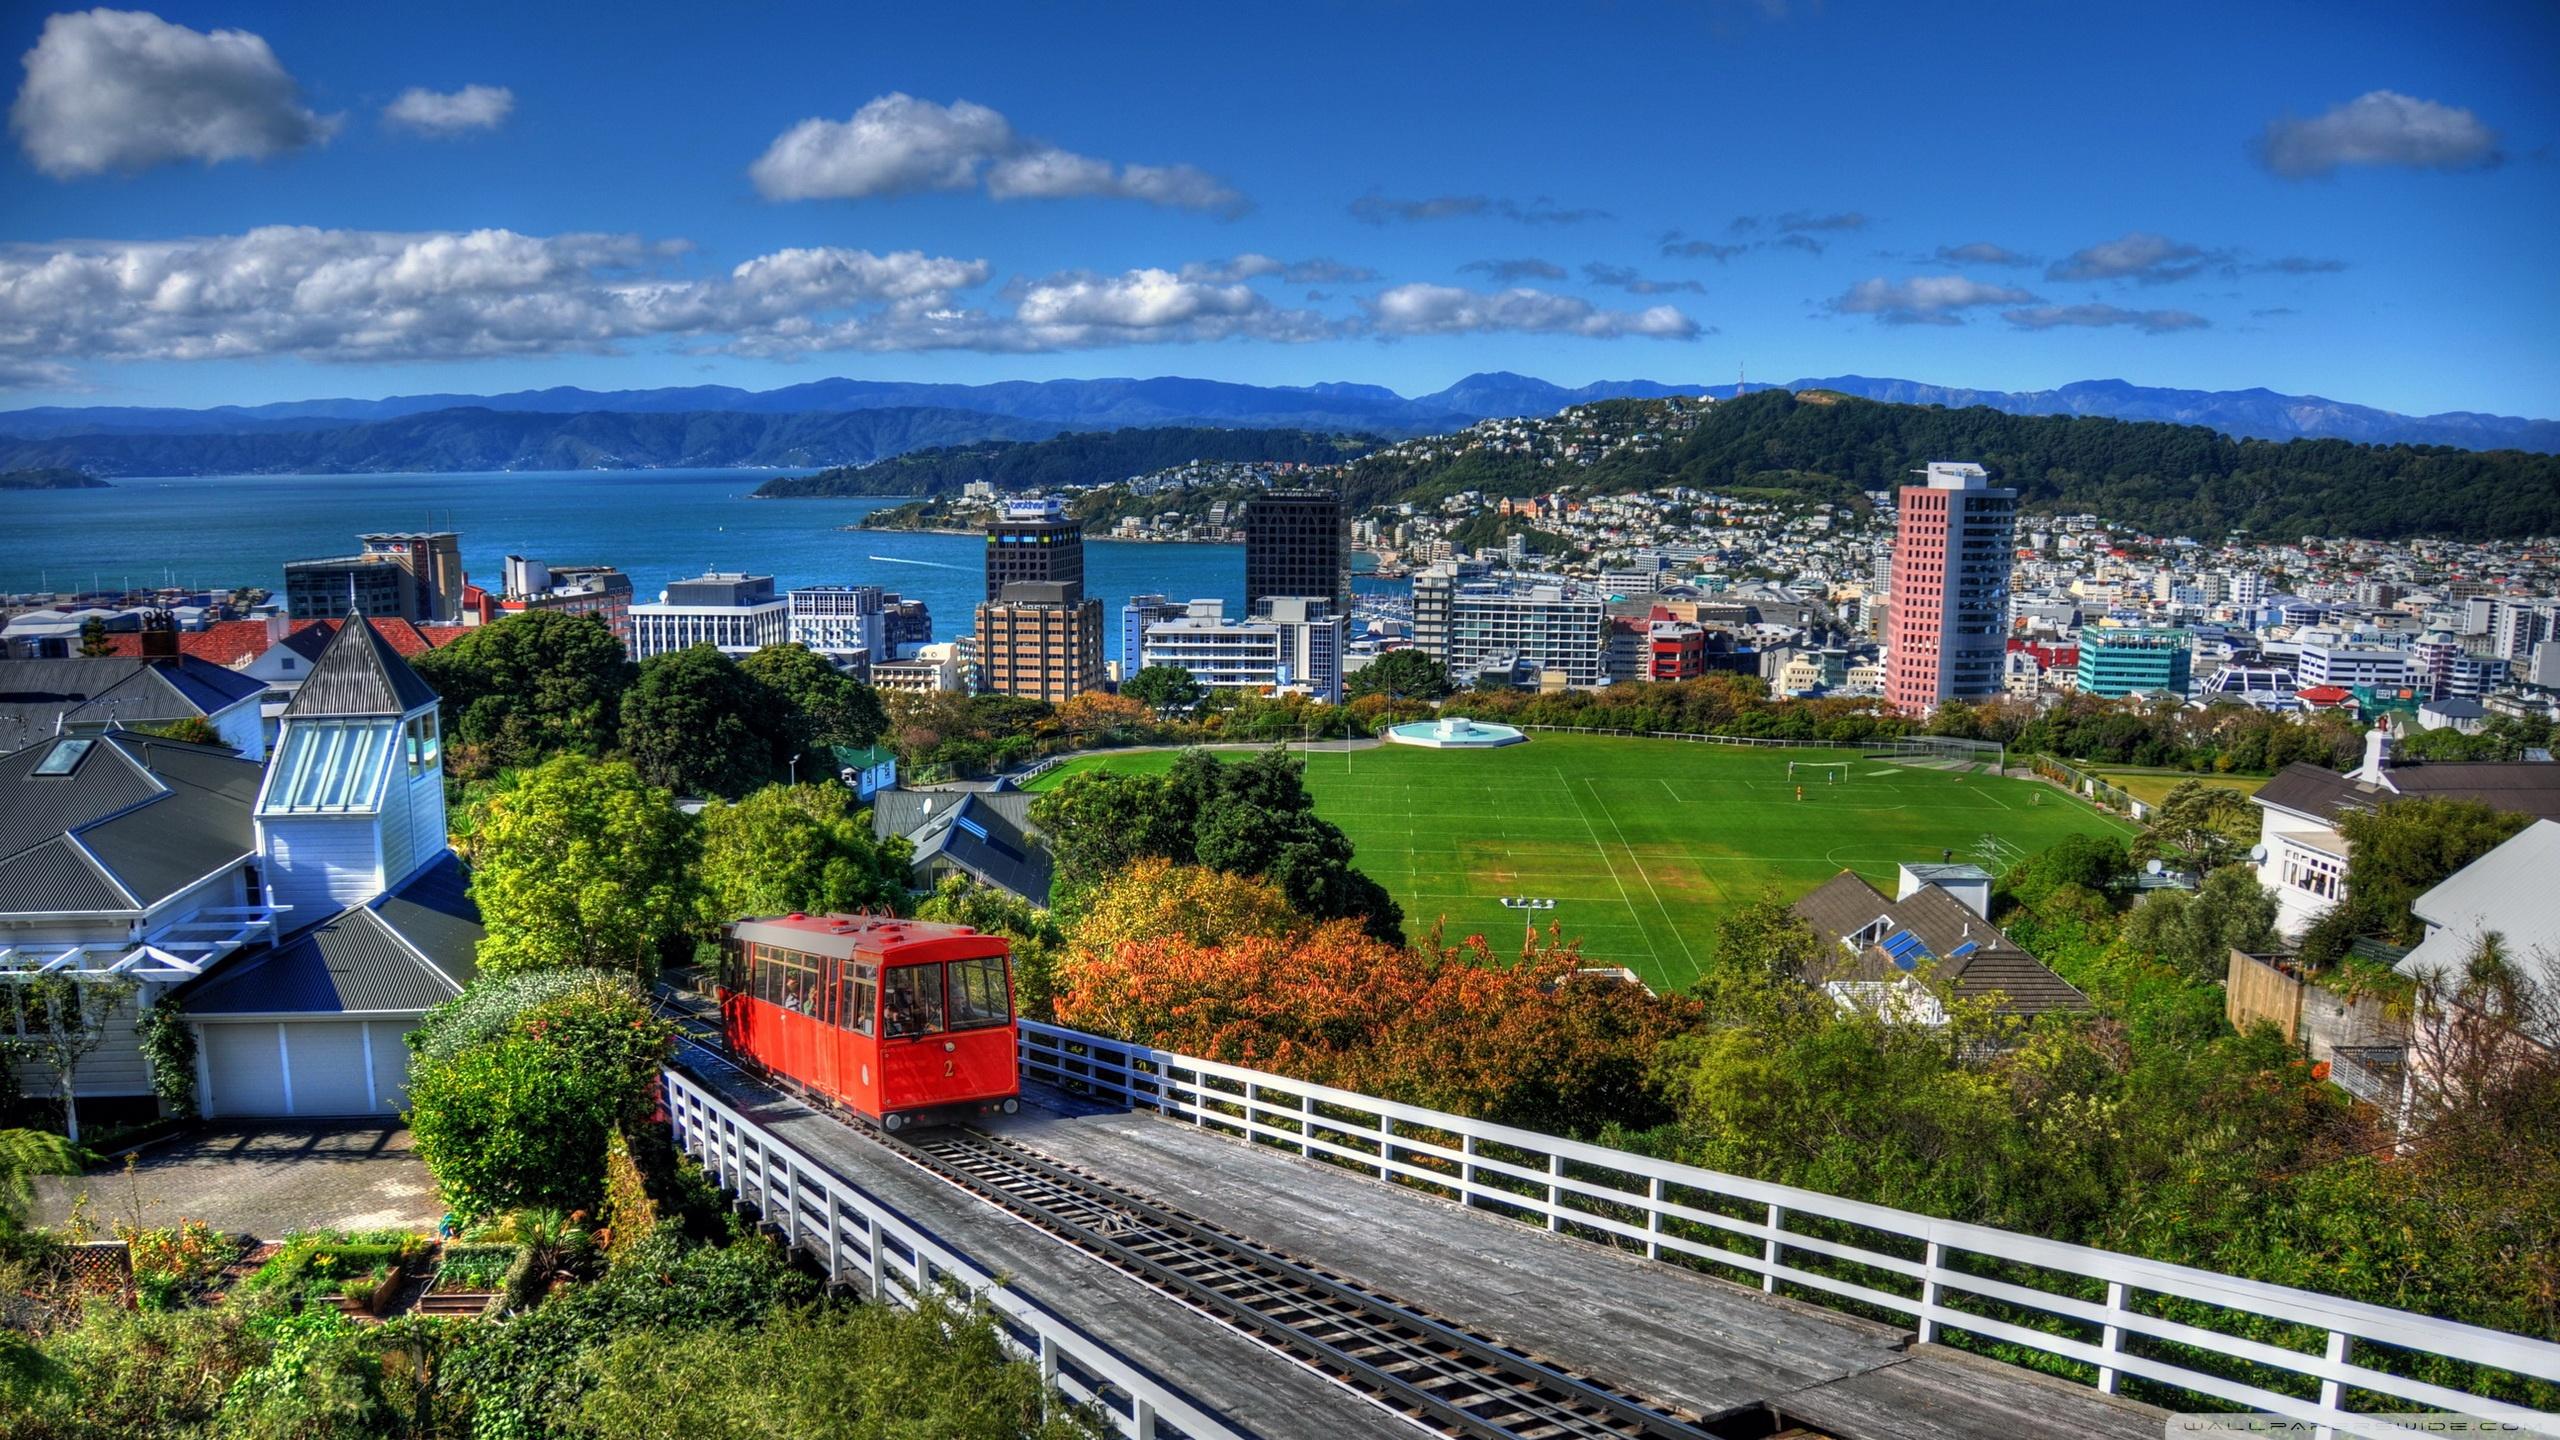 New Zealand Houses Wellington From Above 4K HD Desktop 2560x1440